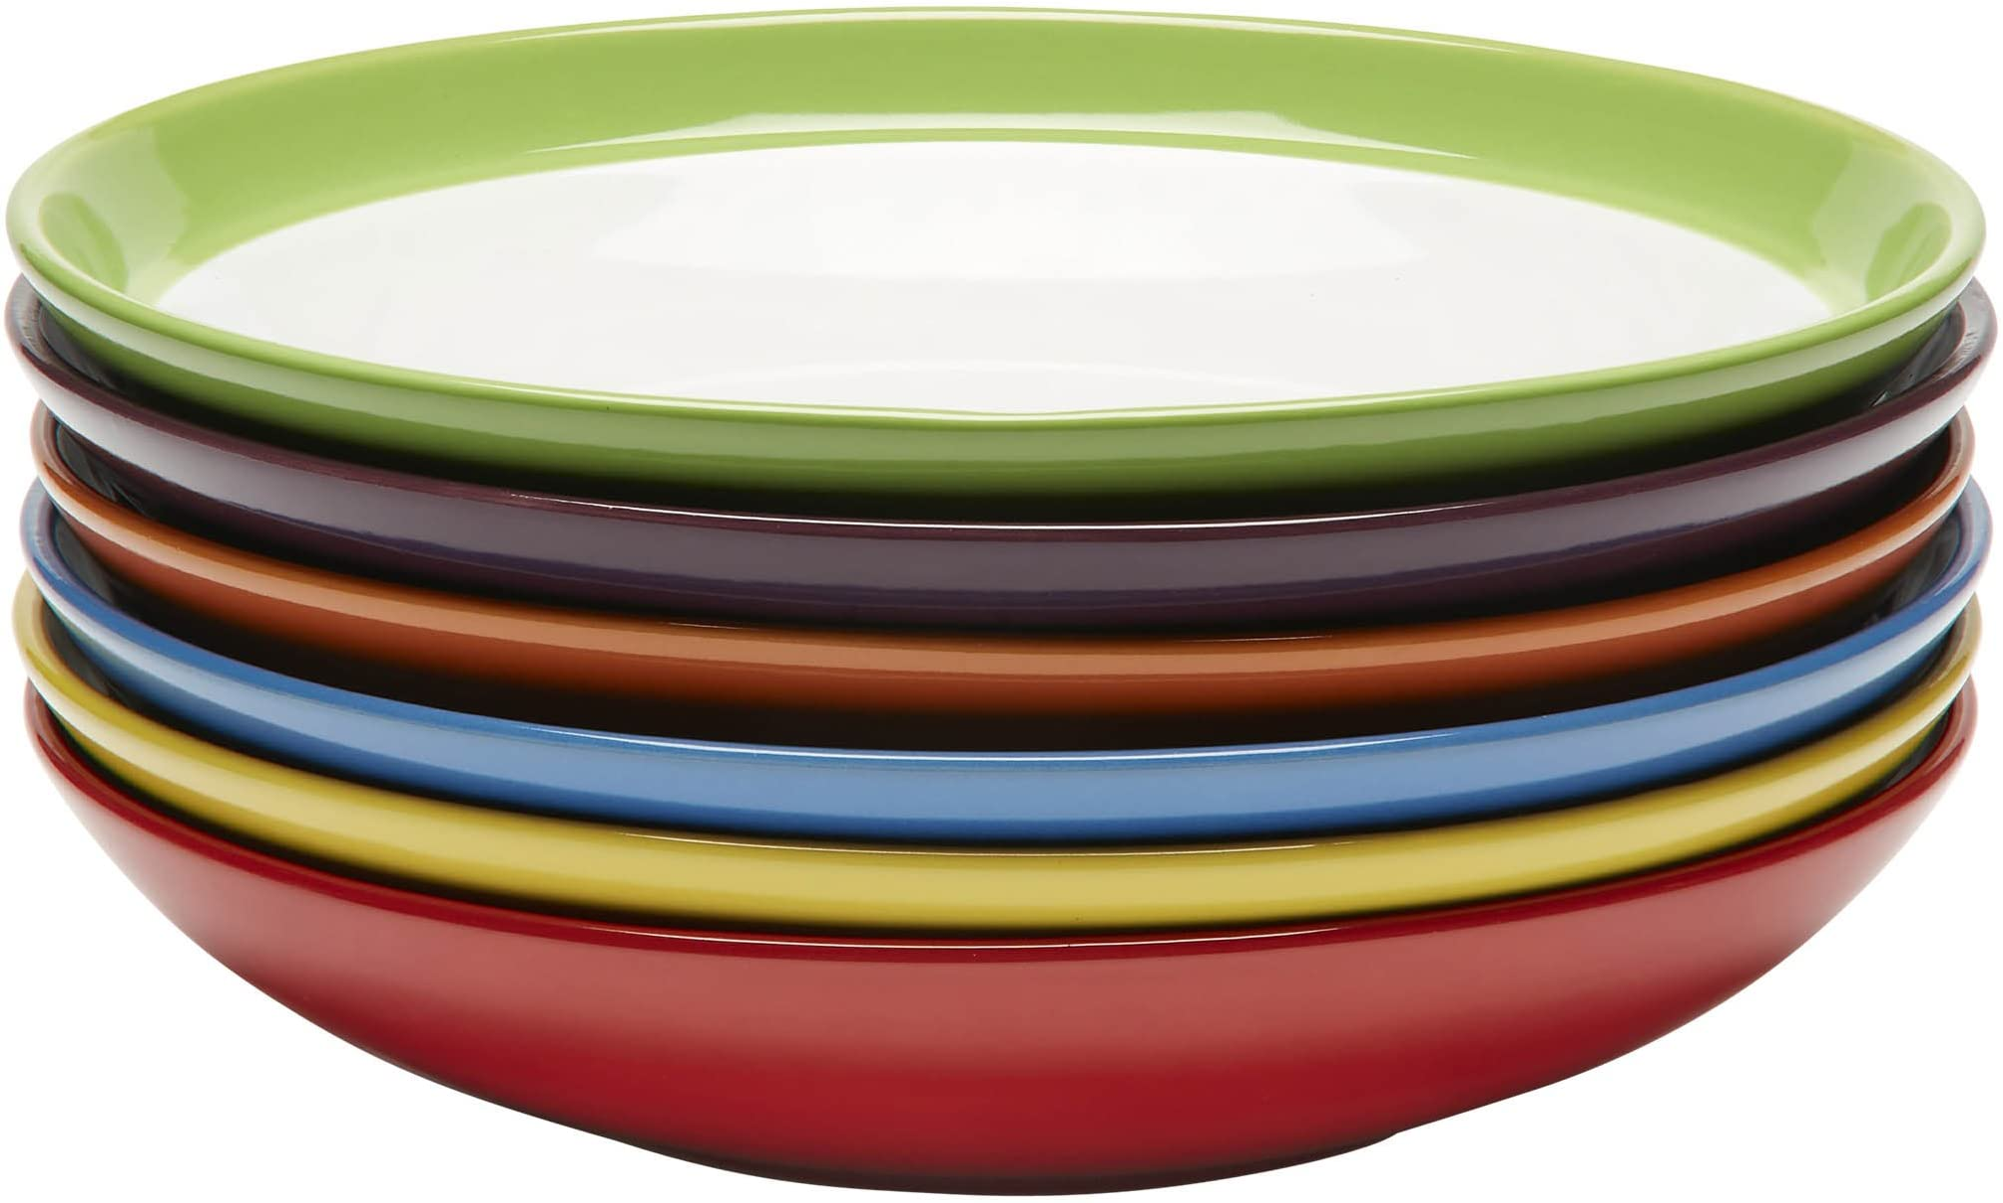 Couple Gift Idea Pasta Plate Noodles Bowl Gray Ceramic Dinner Plate New Home Gift Handmade Ceramic Dinnerware Modern Pottery Bowl